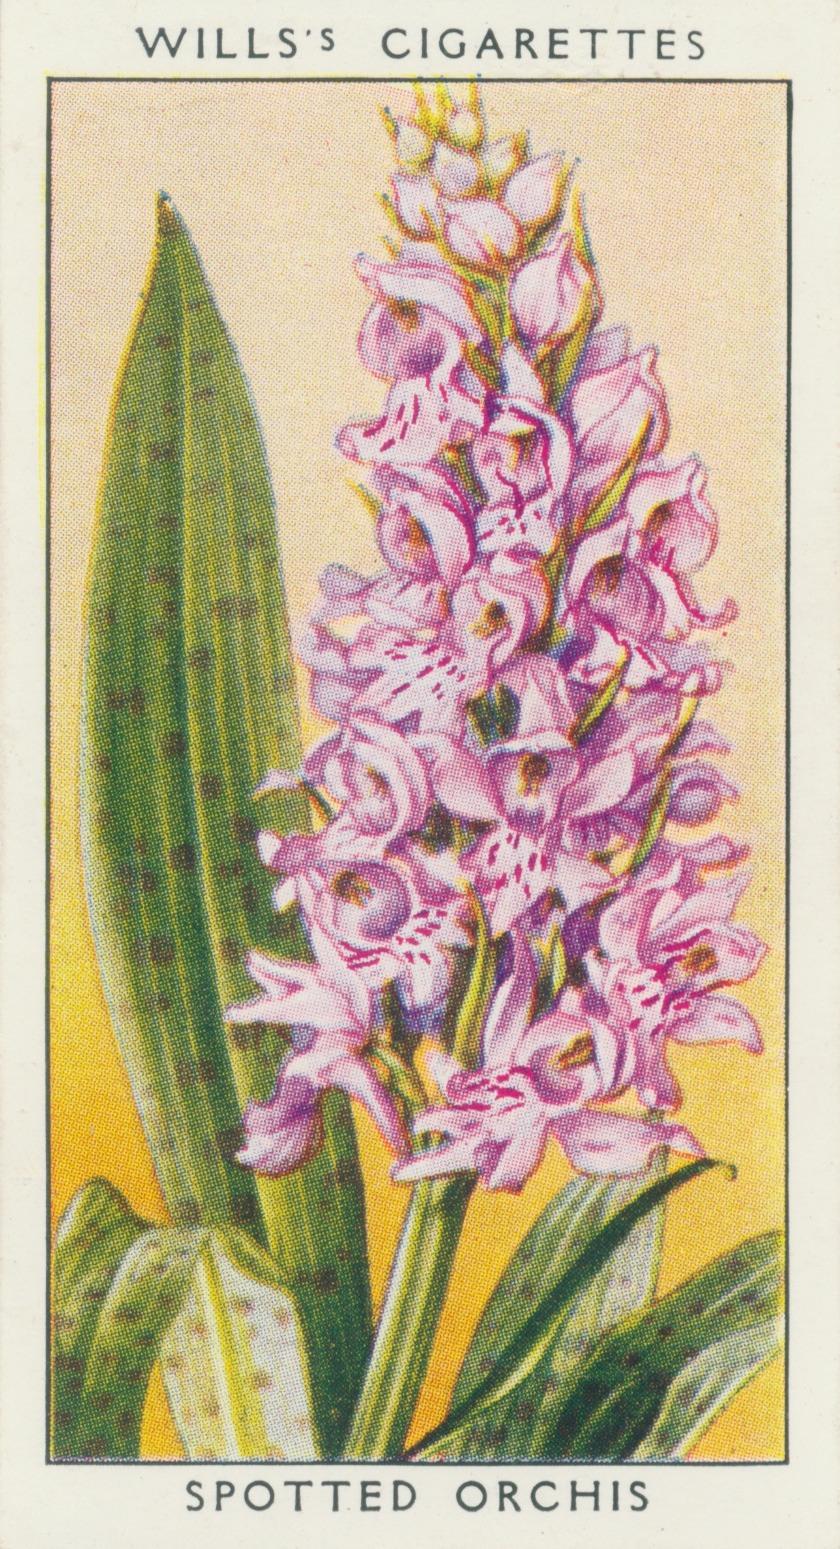 http://3.bp.blogspot.com/-AddanqTLcF8/UwiS7YIQpHI/AAAAAAAANtA/CeakAkNRVqE/s1600/spotted+orchis.cv.jpg